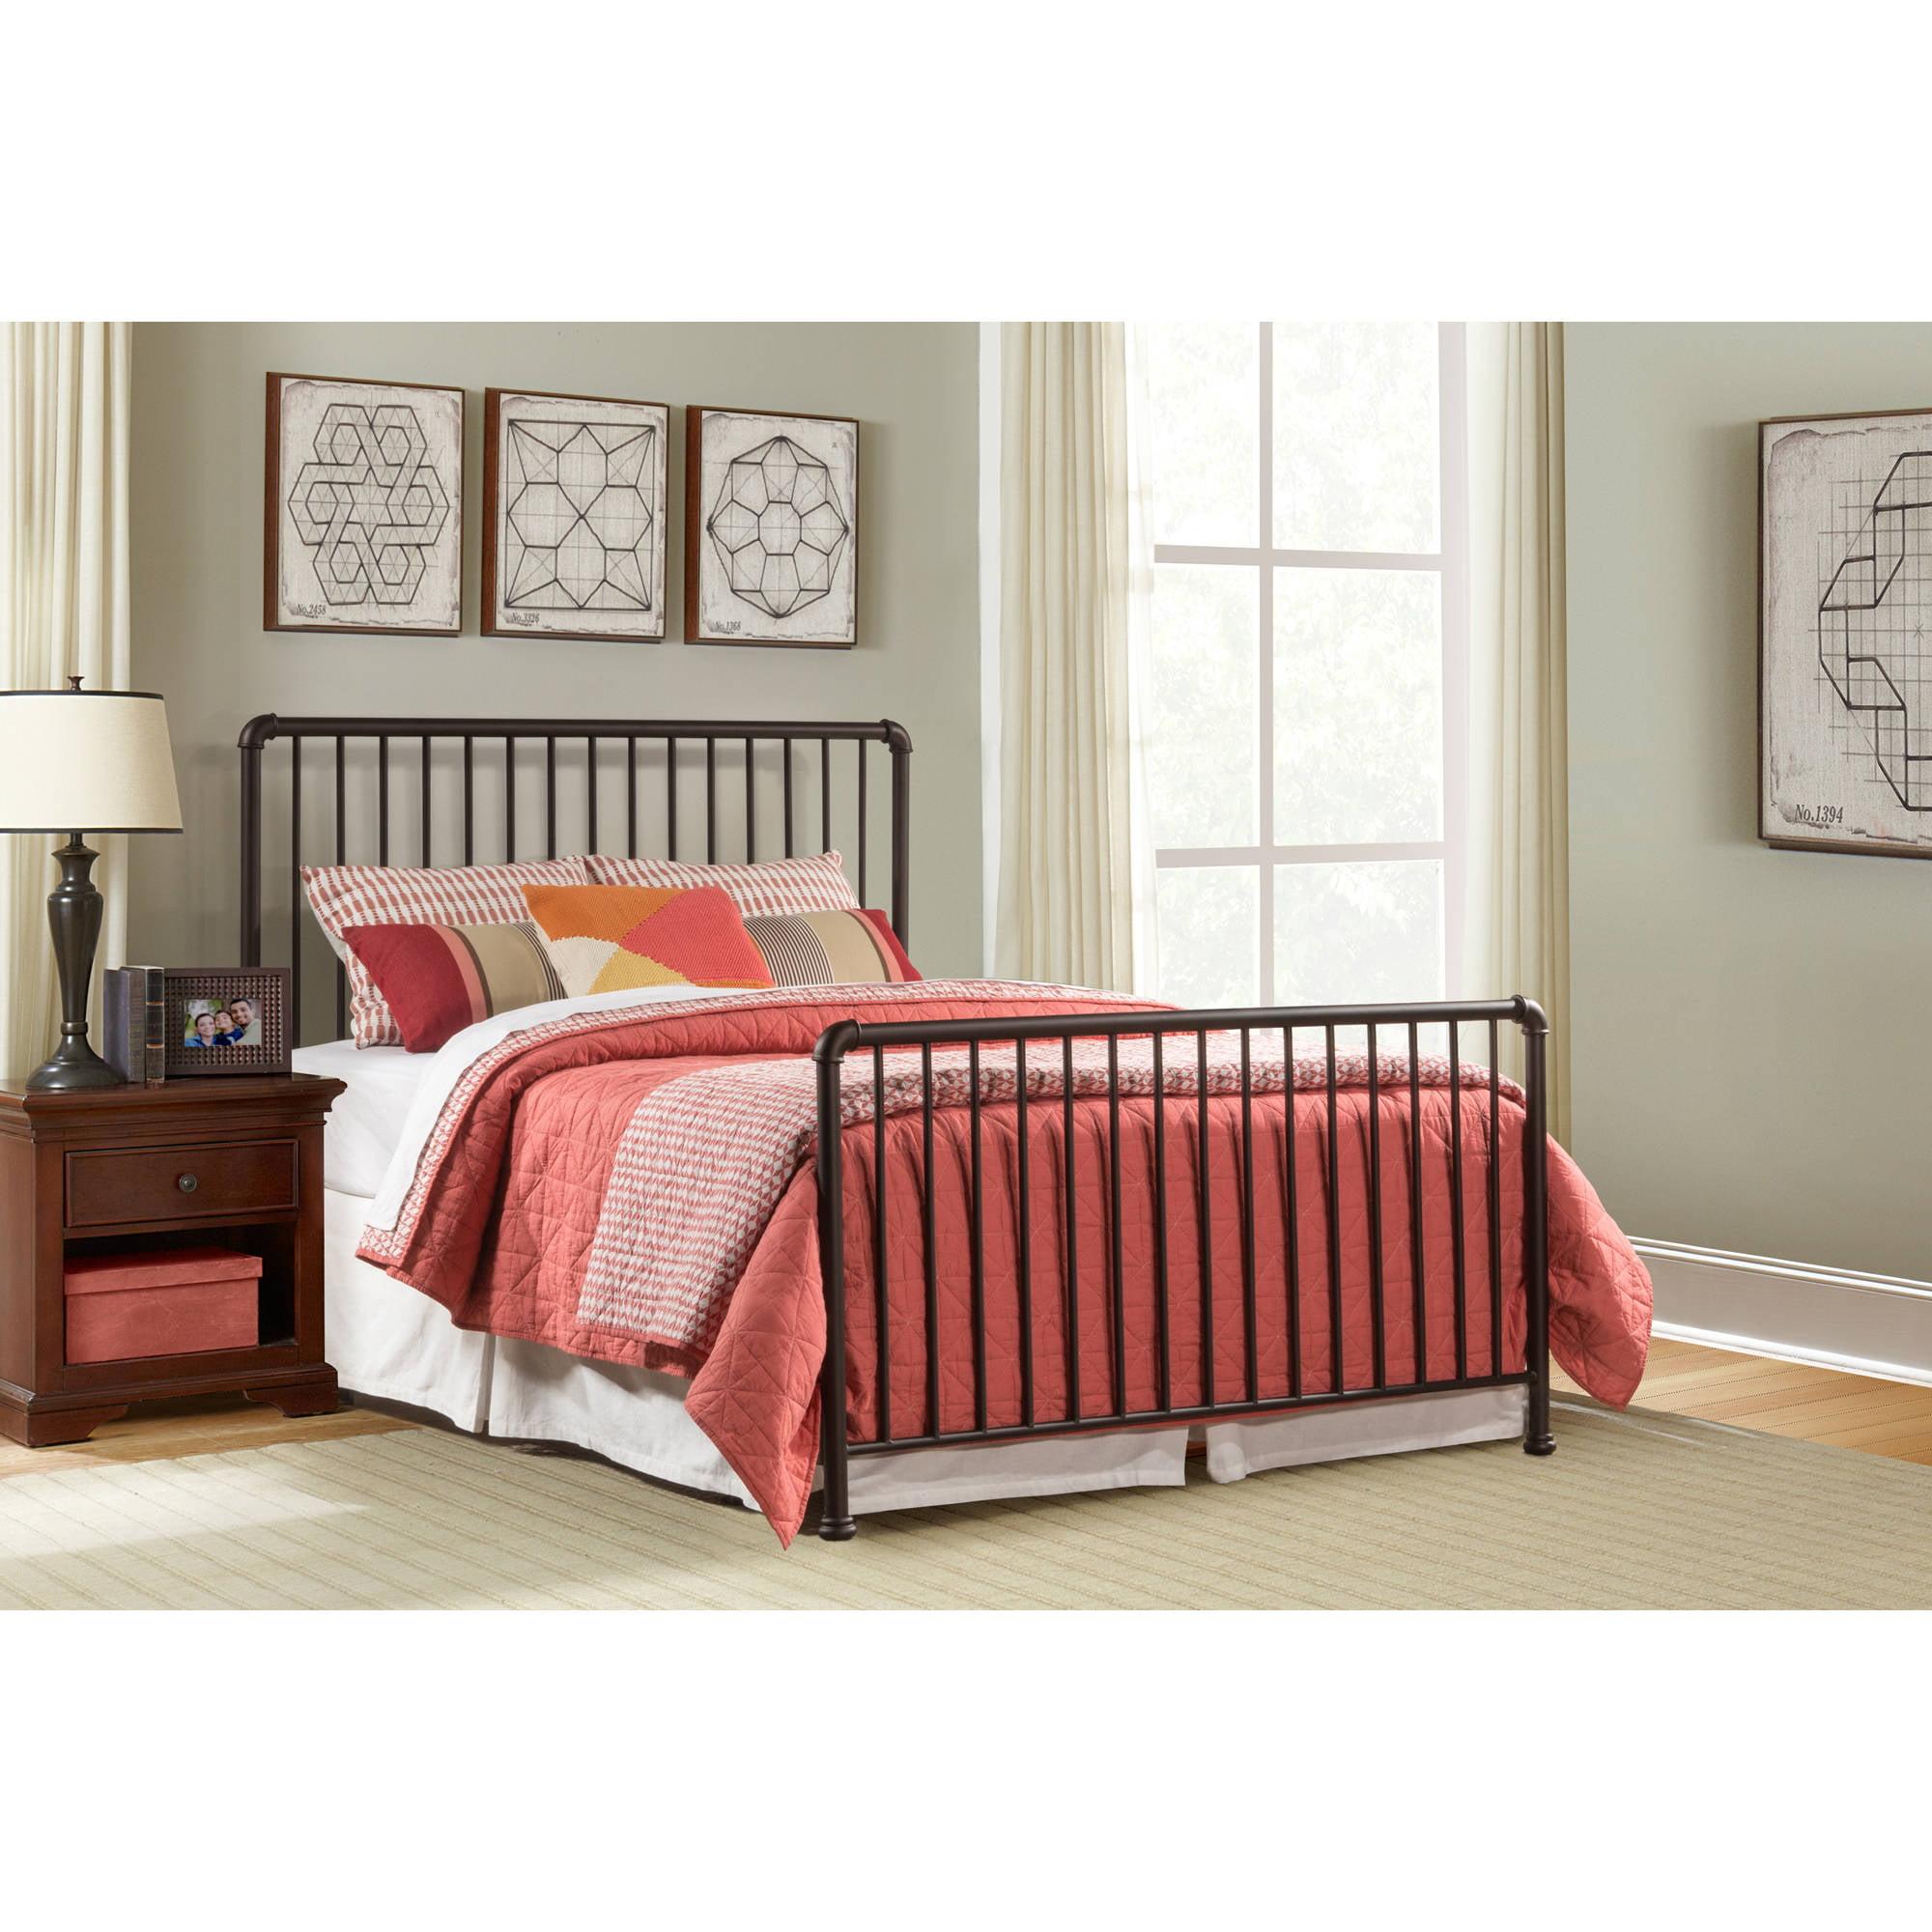 Hillsdale Furniture Brandi Bed by Hillsdale Furniture